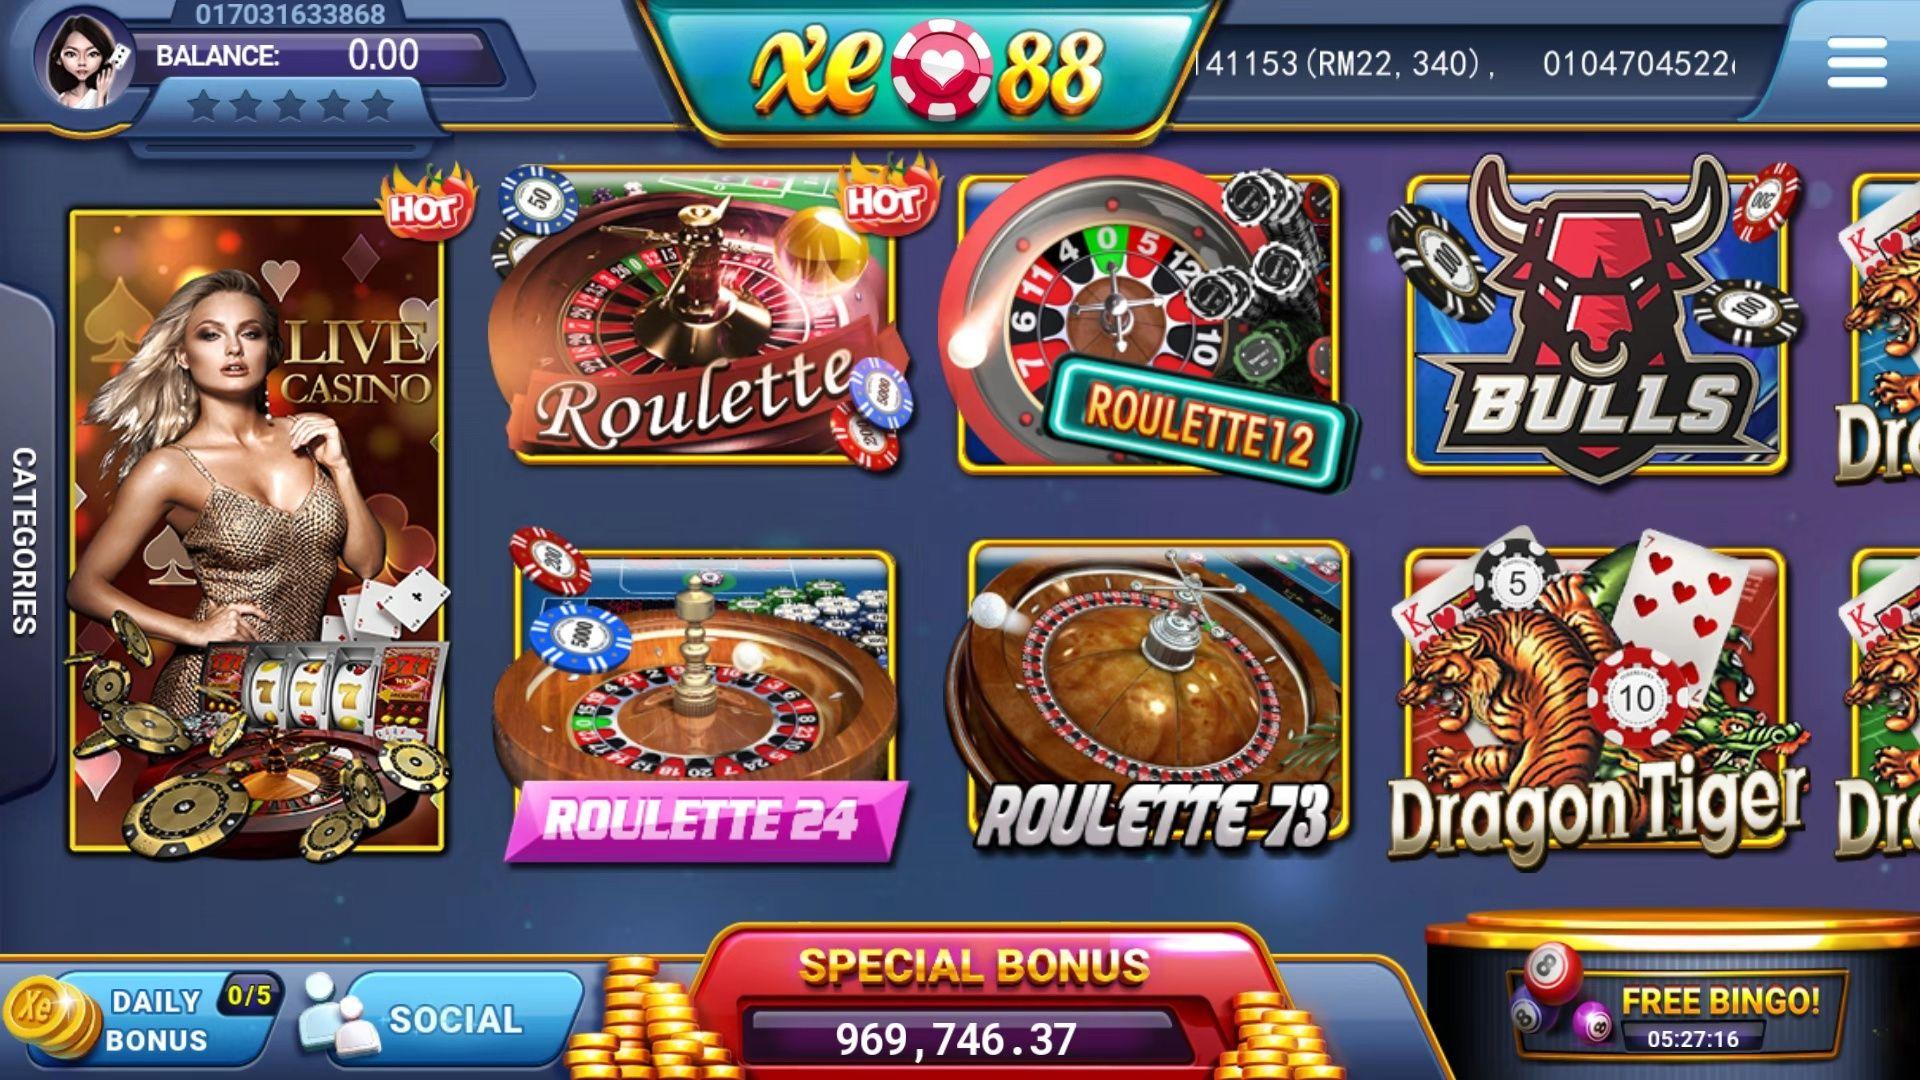 Casino Net Download Client